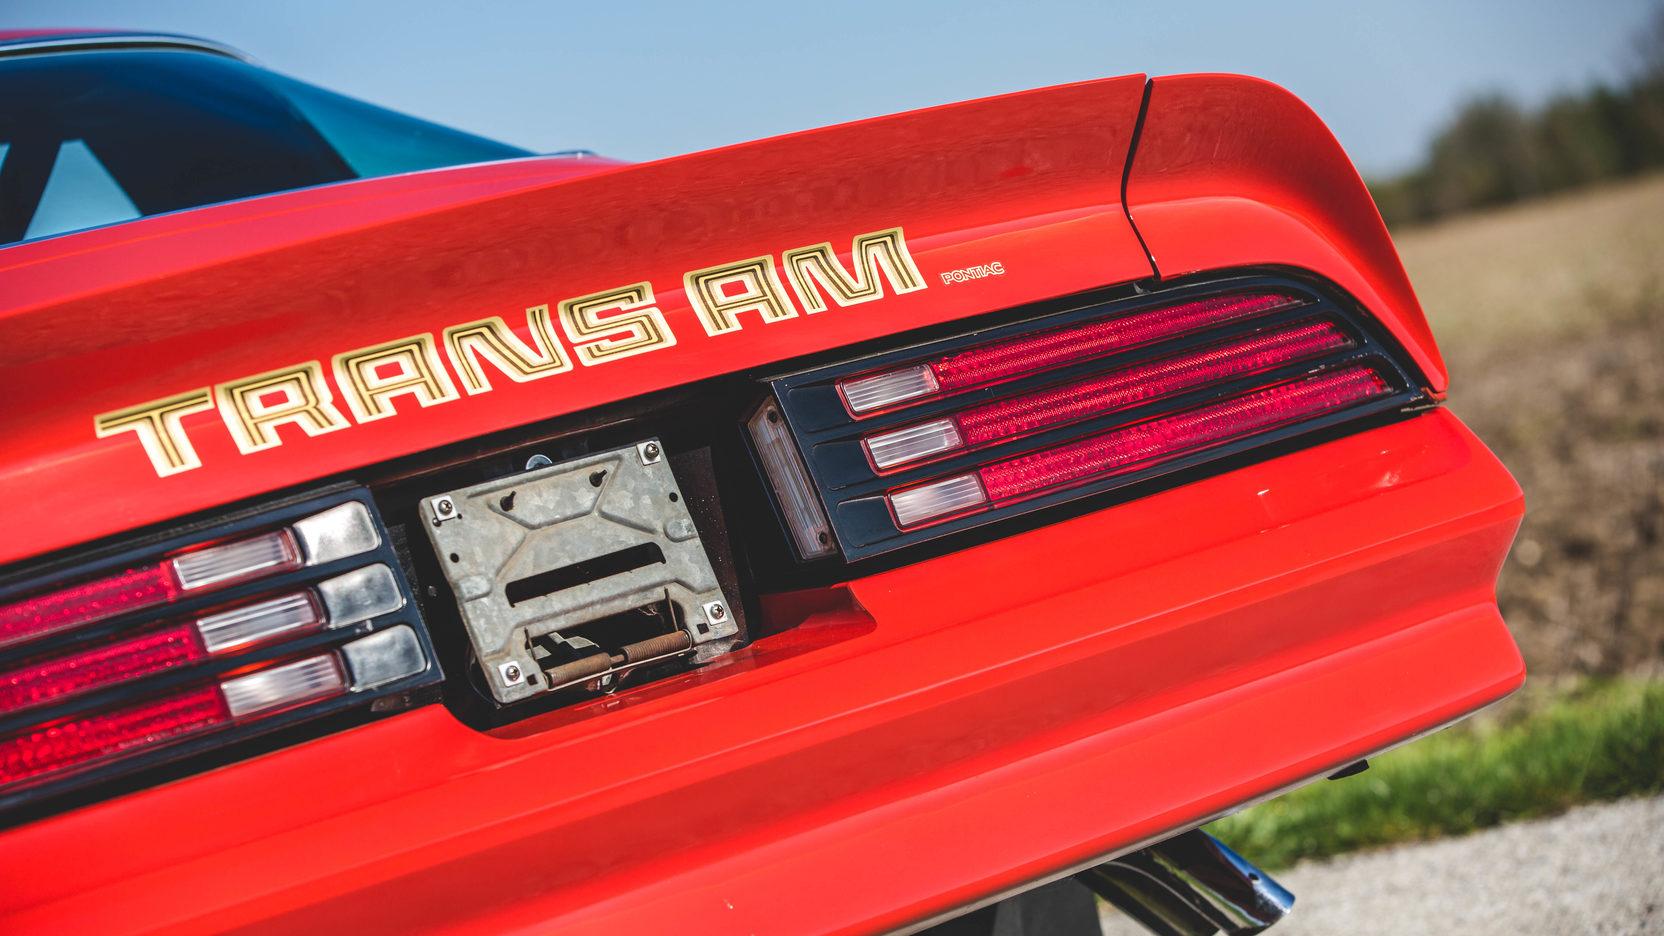 1978 Pontiac Firebird Trans Am taillights